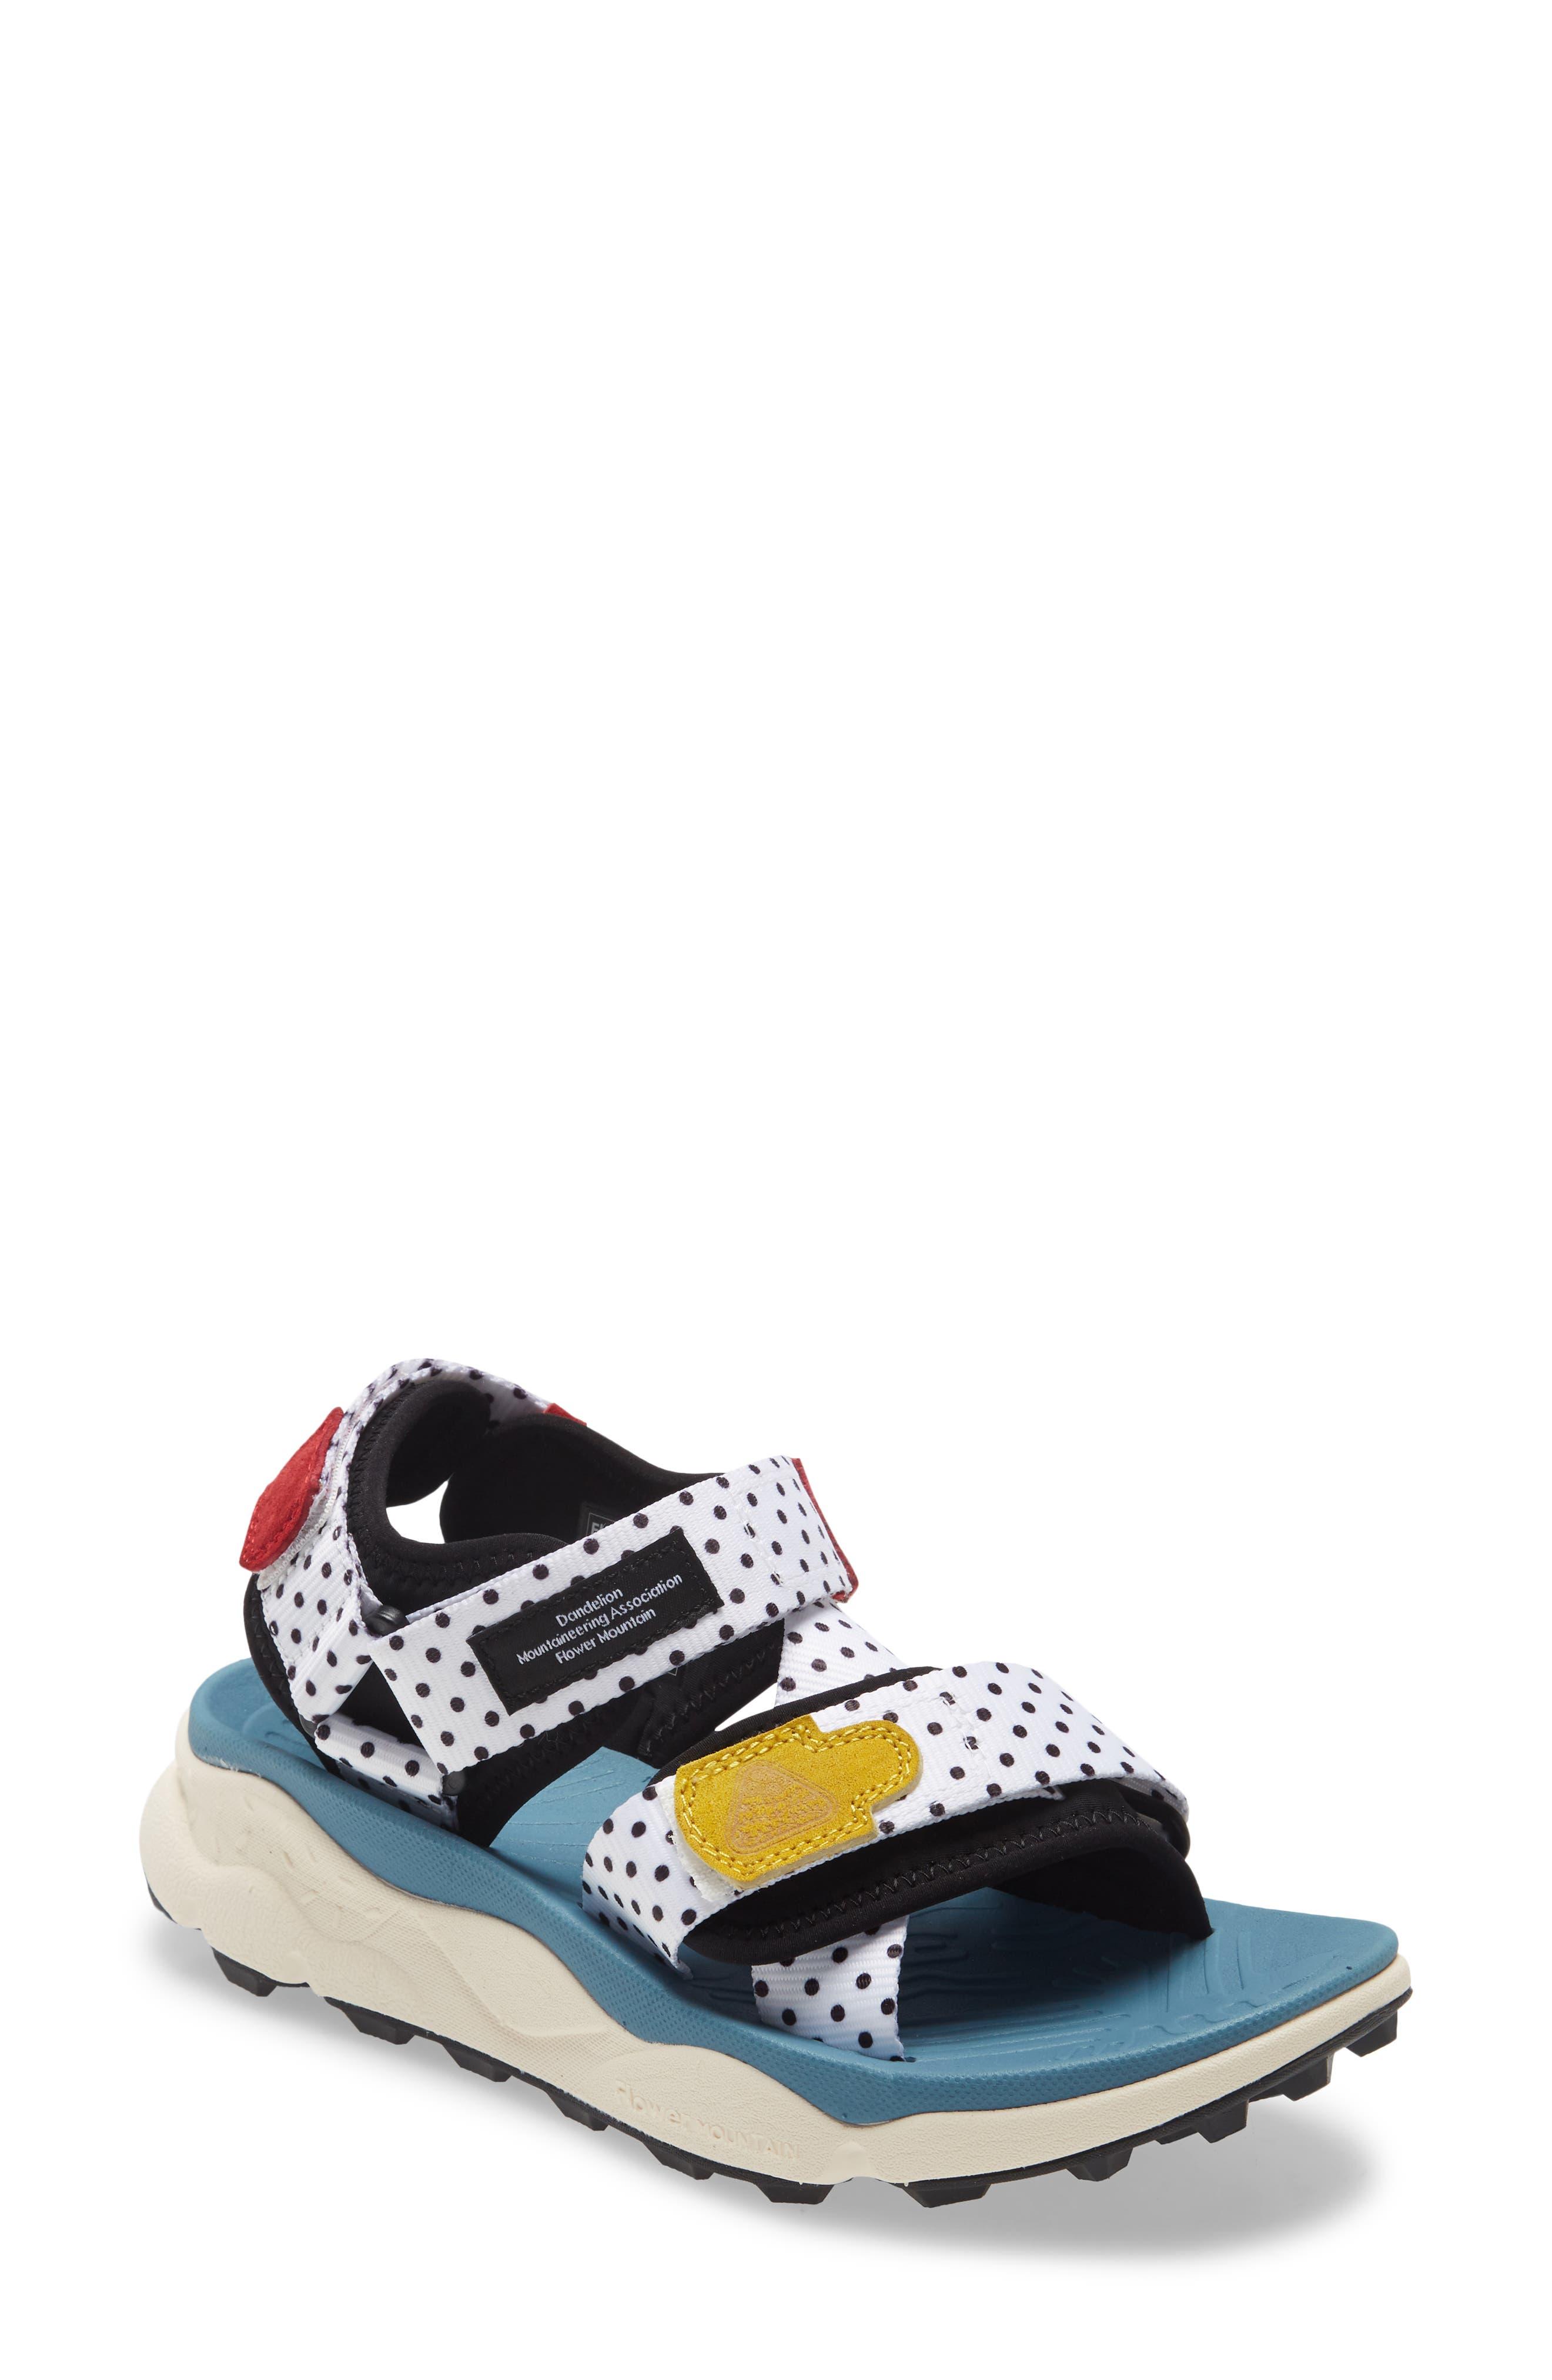 Nazxa 2 Sandal